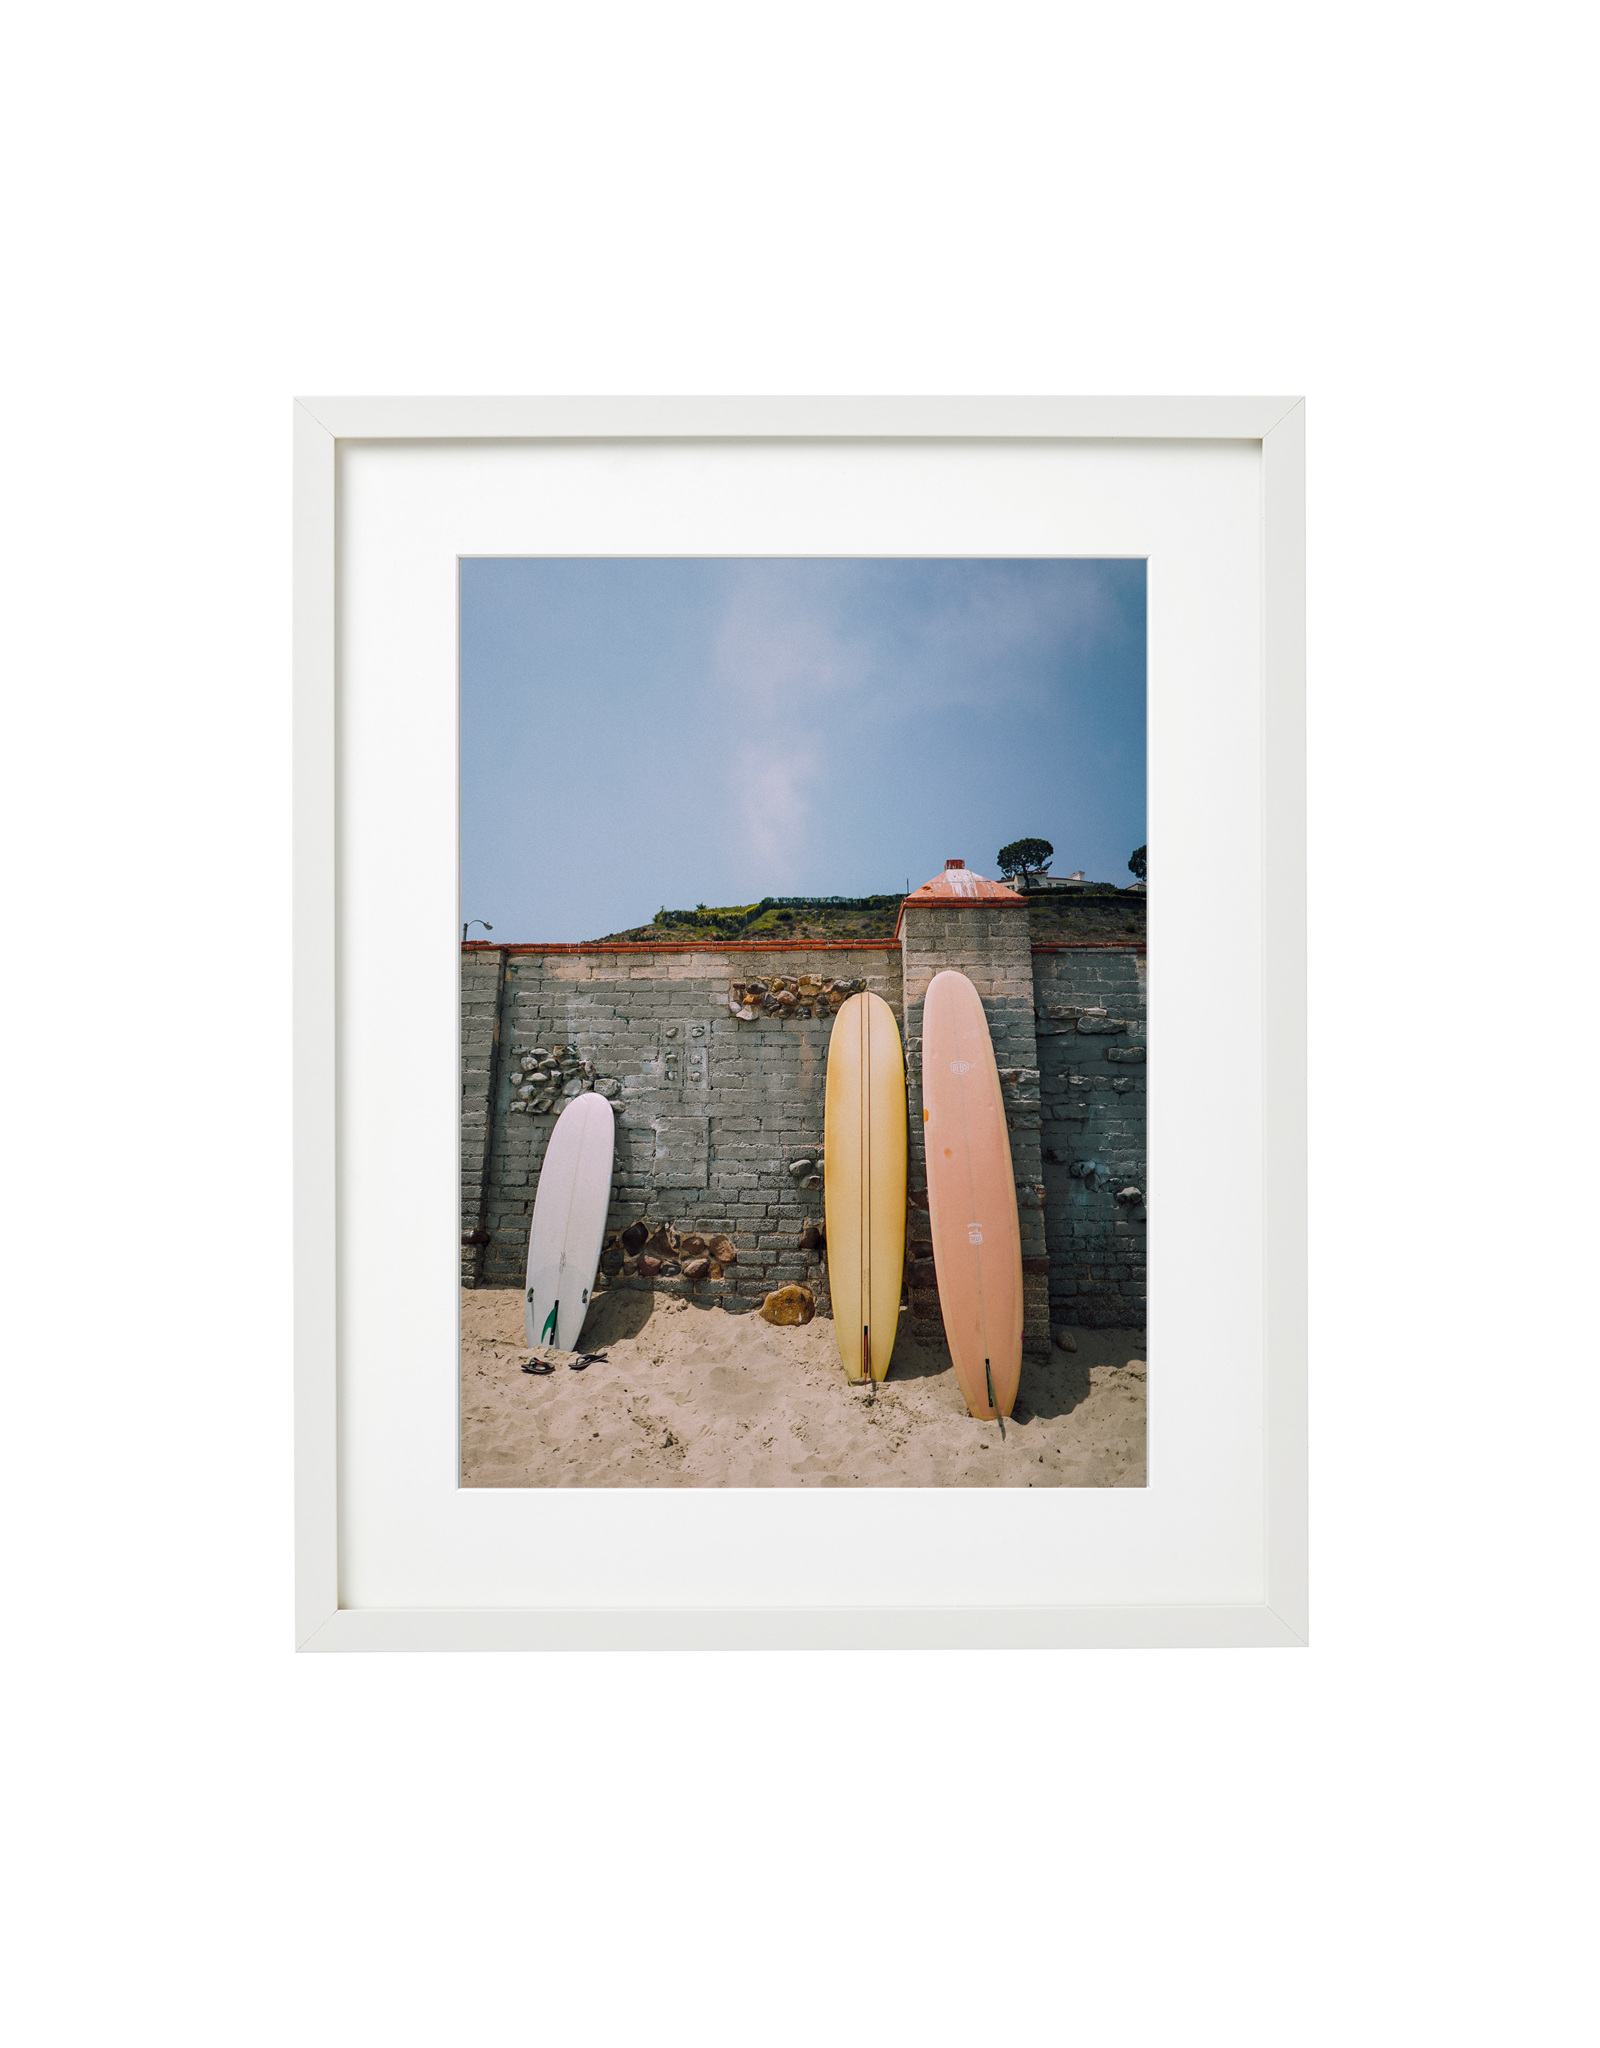 Summer In Full Swing - Félix Patenaude